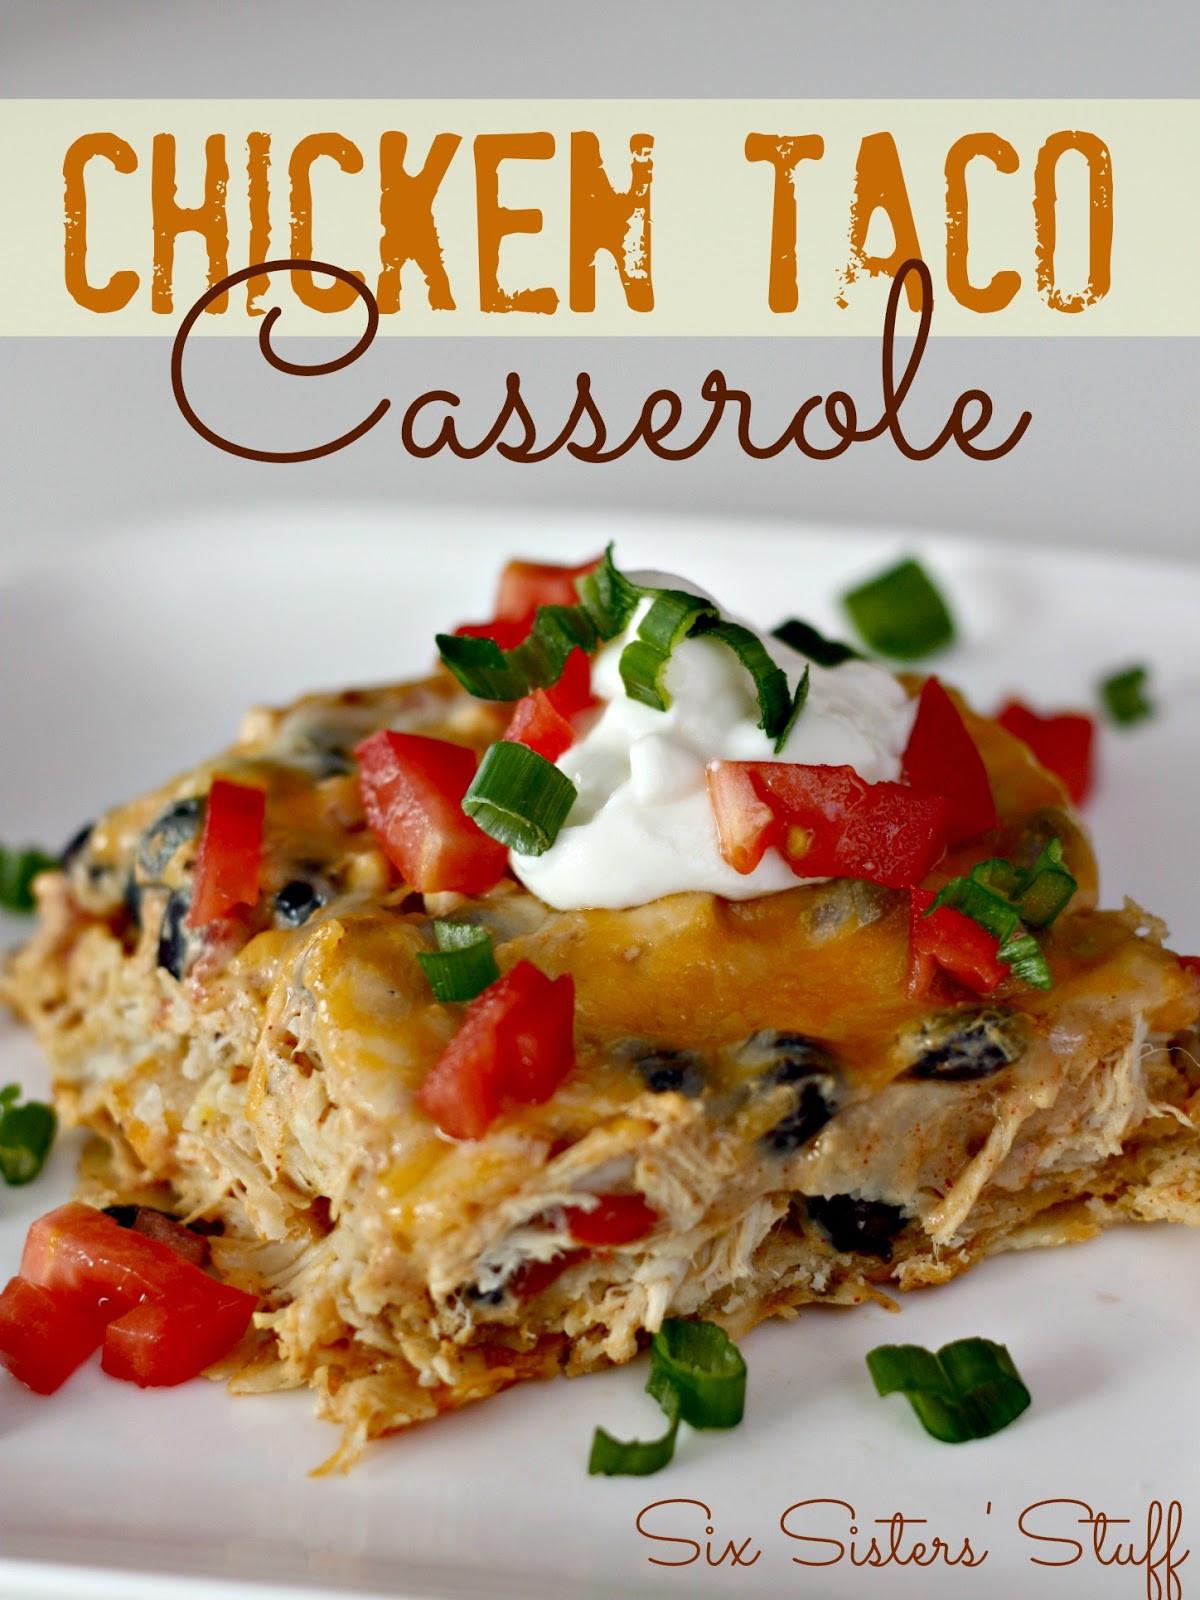 Chicken Taco Casserole  Chicken Taco Casserole